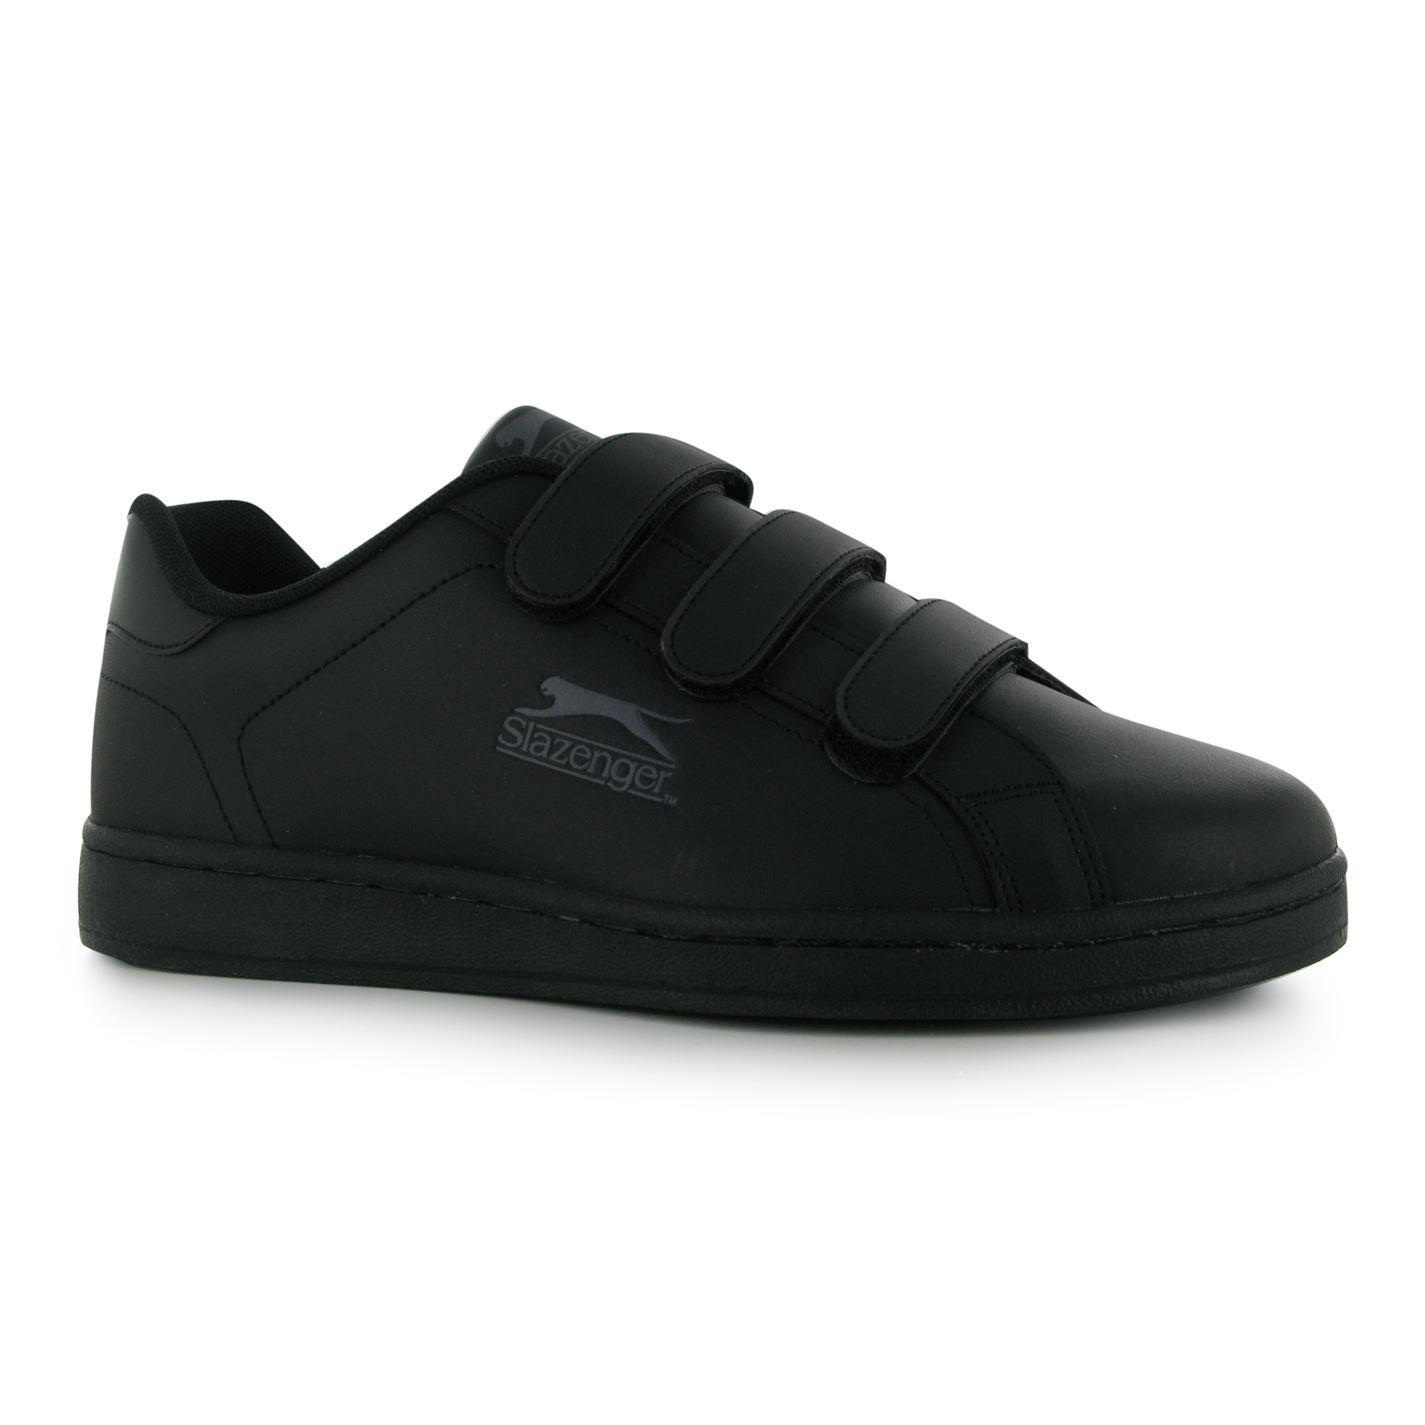 on sale 08adc 98c85 basket adidas garcon scratch off sale shoes